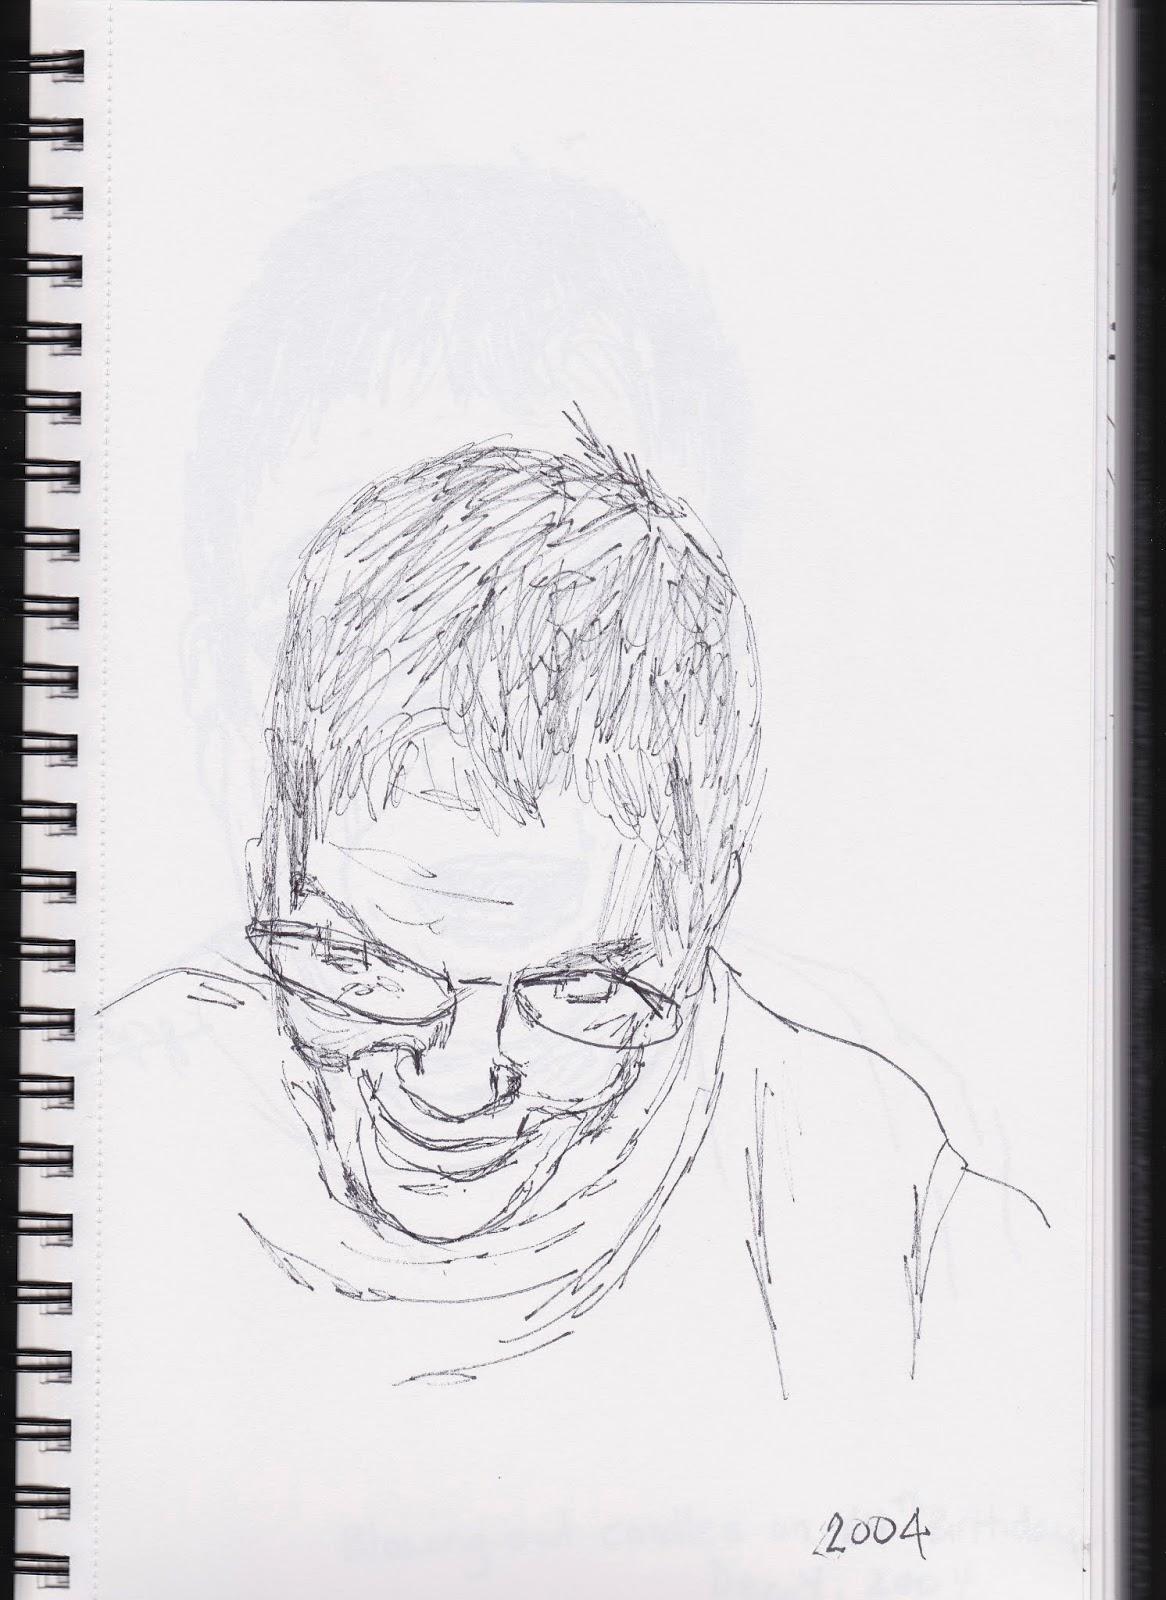 best self portrait essay